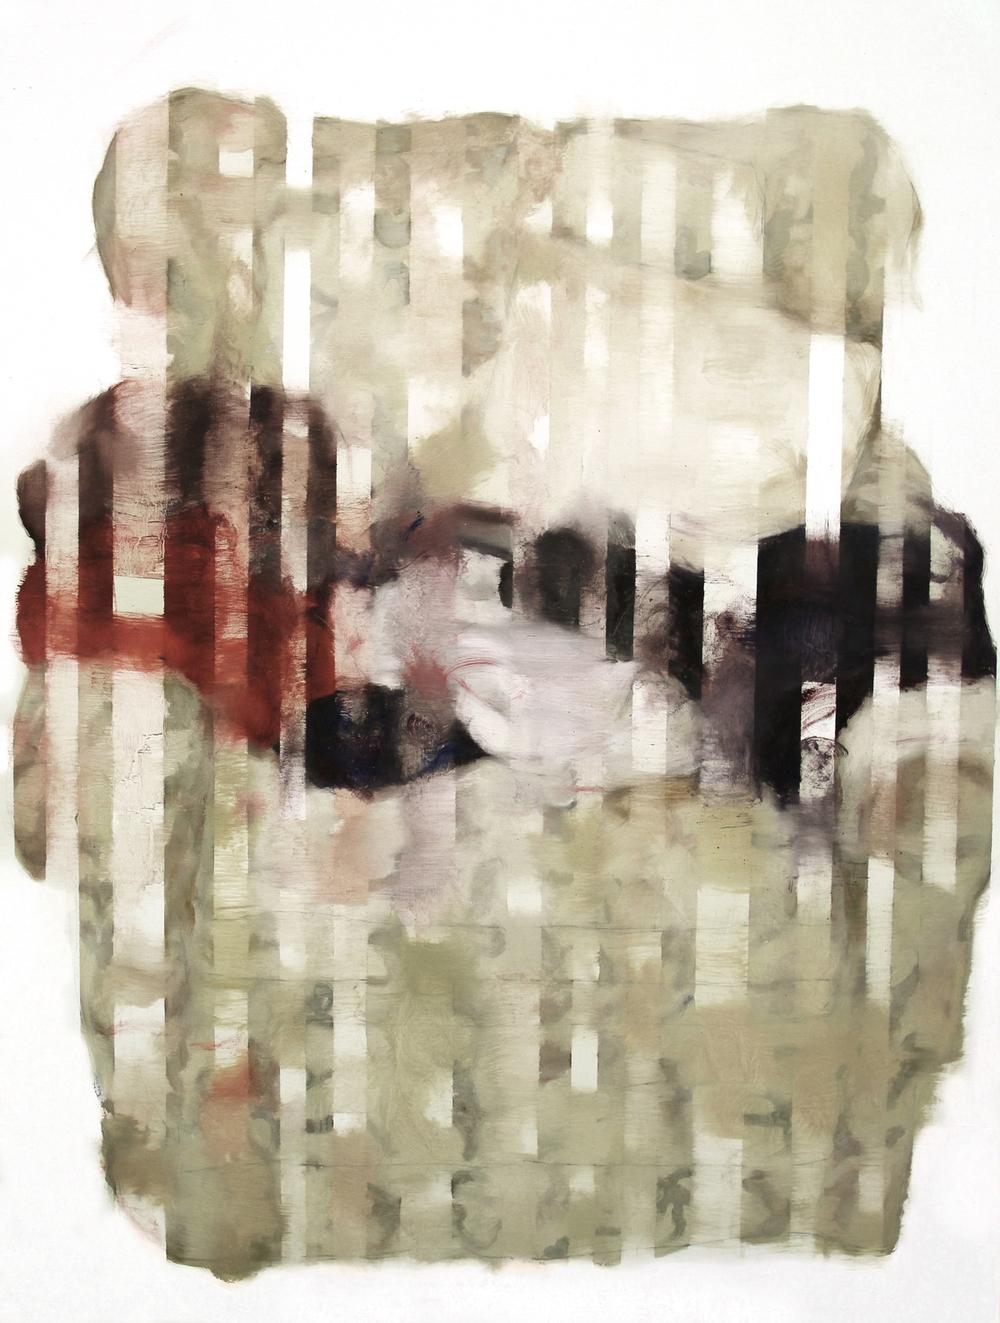 Gaps&Sofa  ,painting, oil on linen, 70 x 100cm, 2011